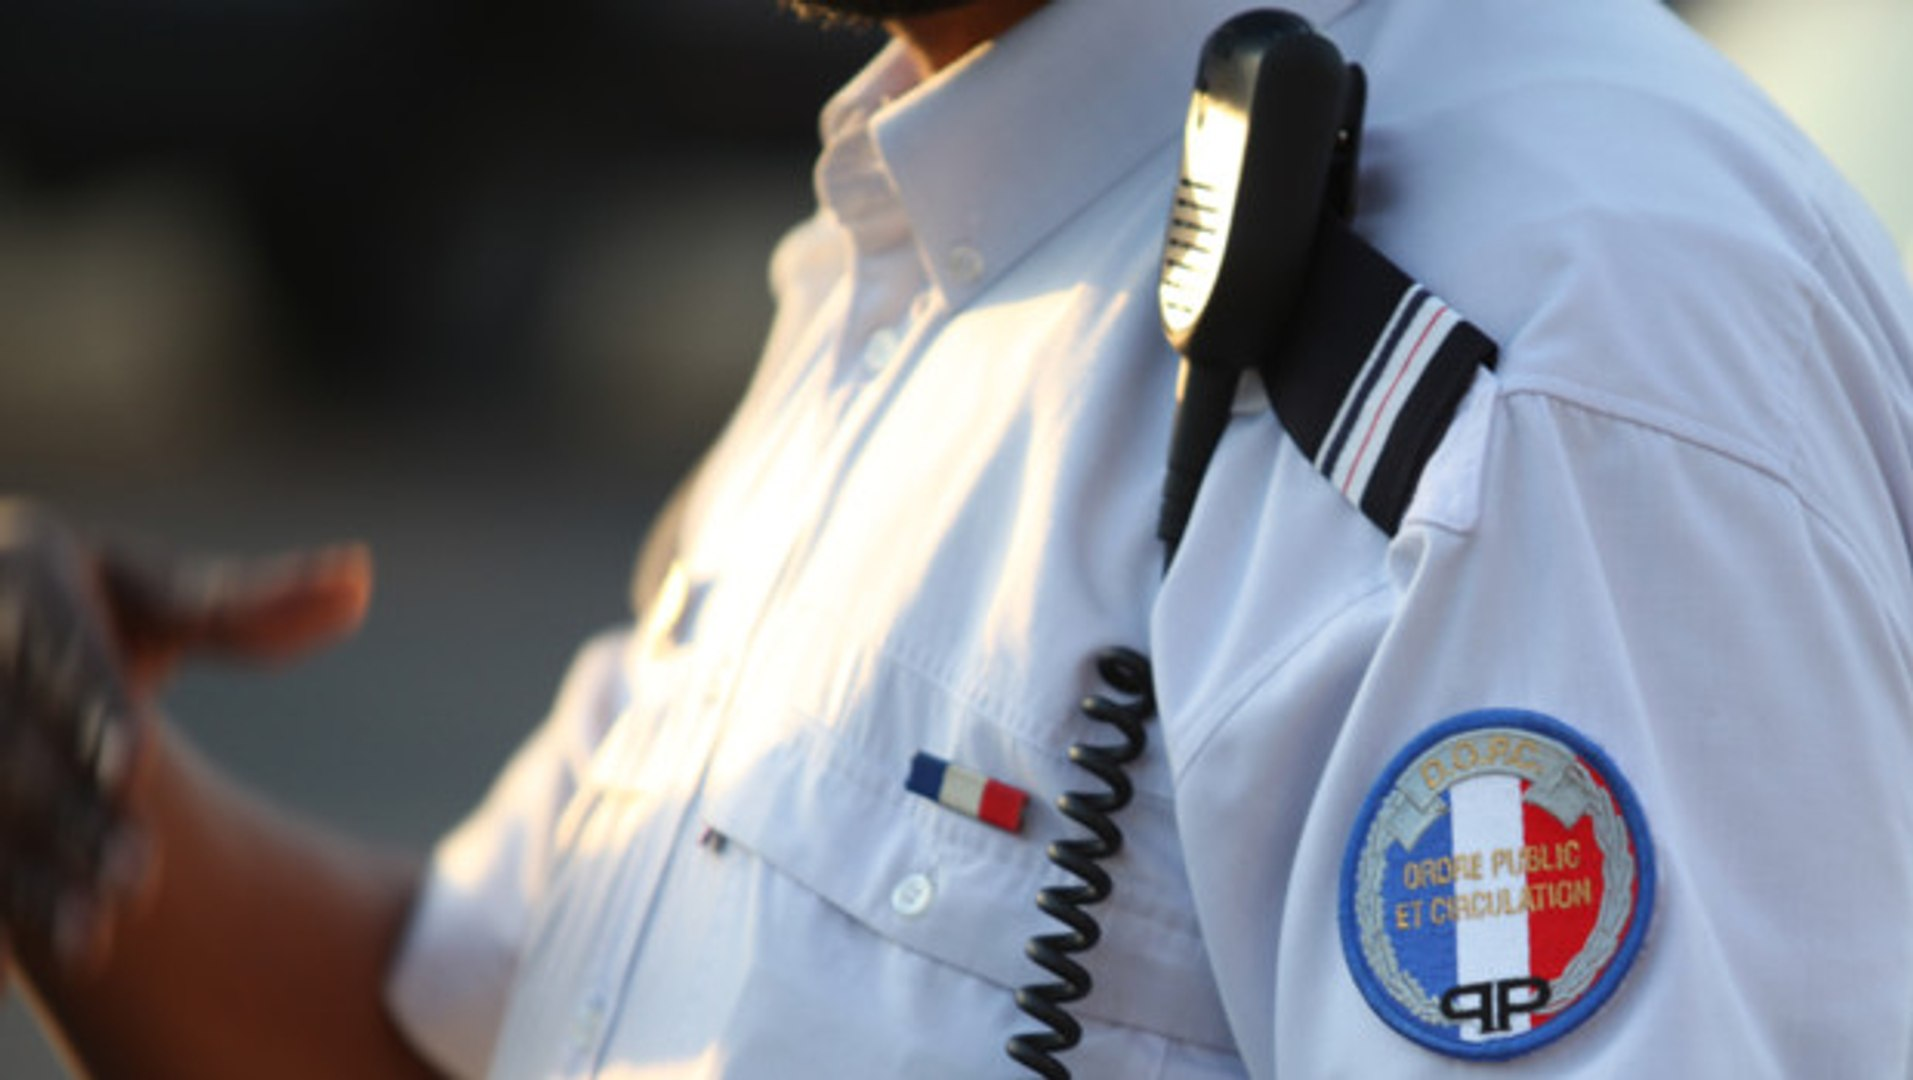 Voyou Met K.O Policiers-ARMÉS Flic-Guadeloupe Vrai Chôchôtte ! Zô Armé é En Tap Si Cask Aw W j